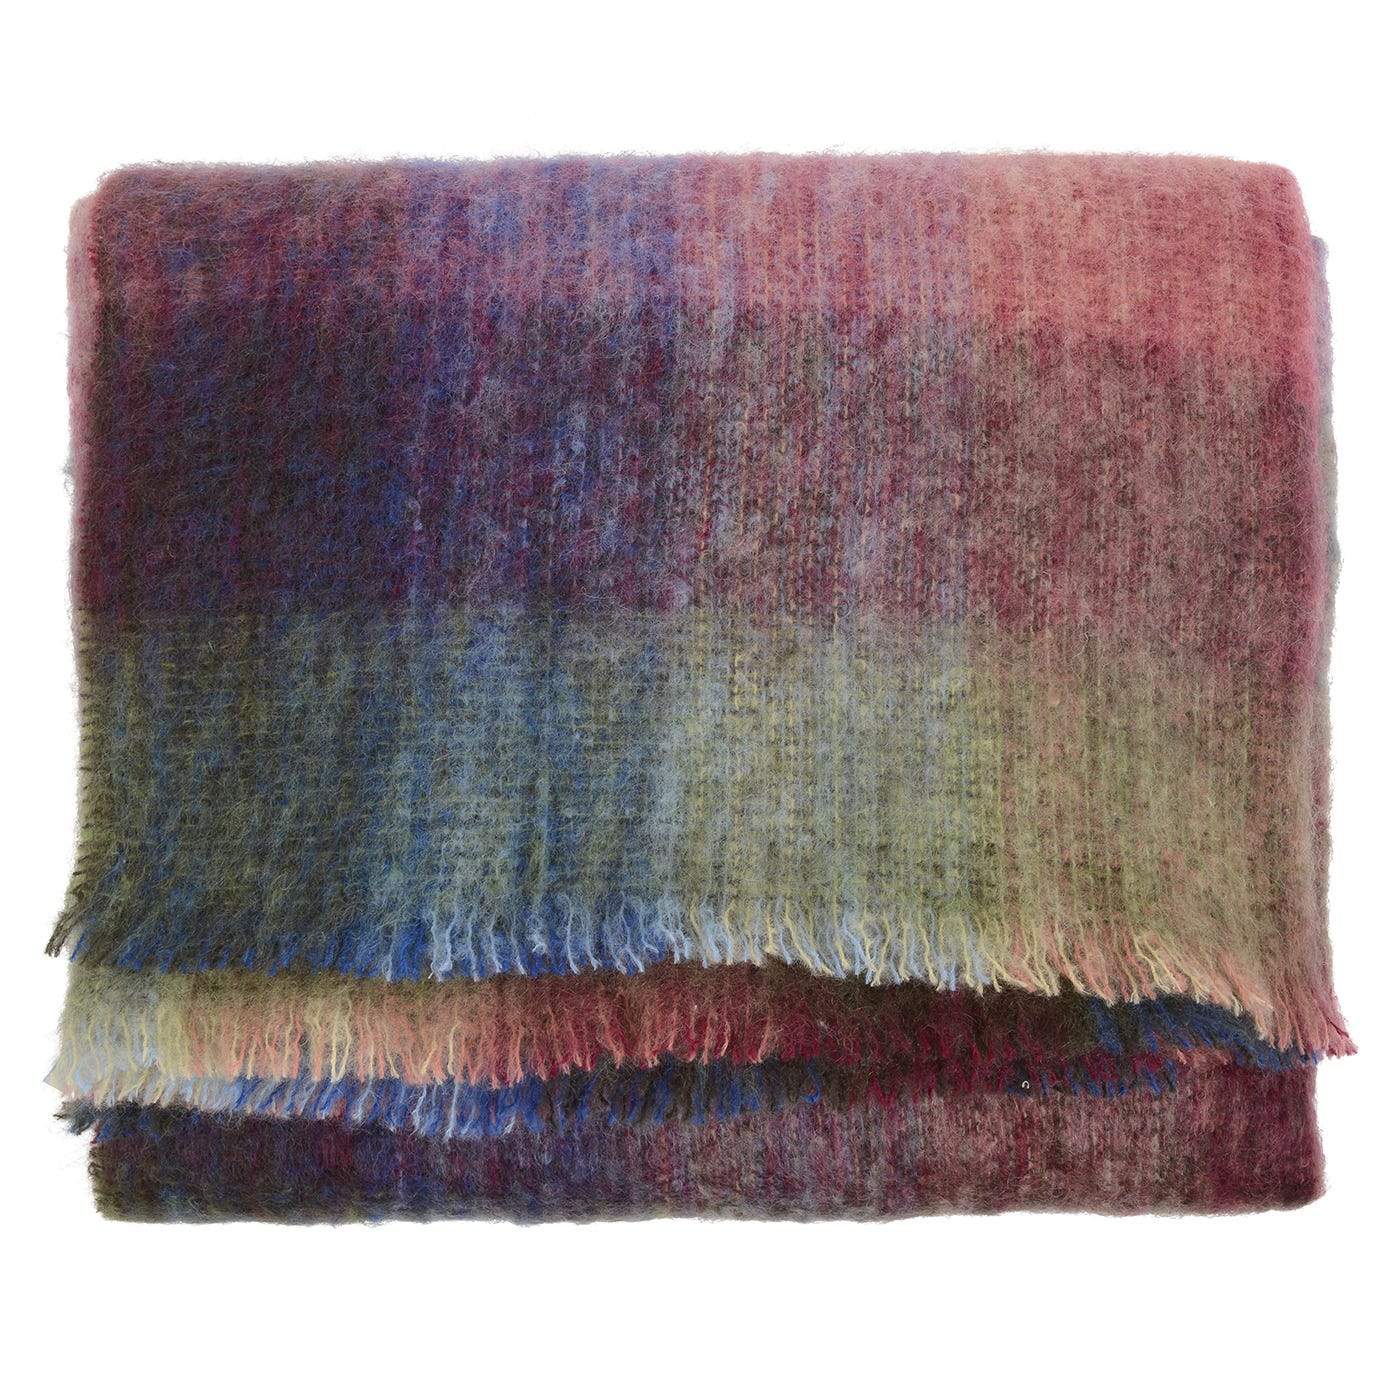 Birchwood : Ireland - Peach Mohair Blanket